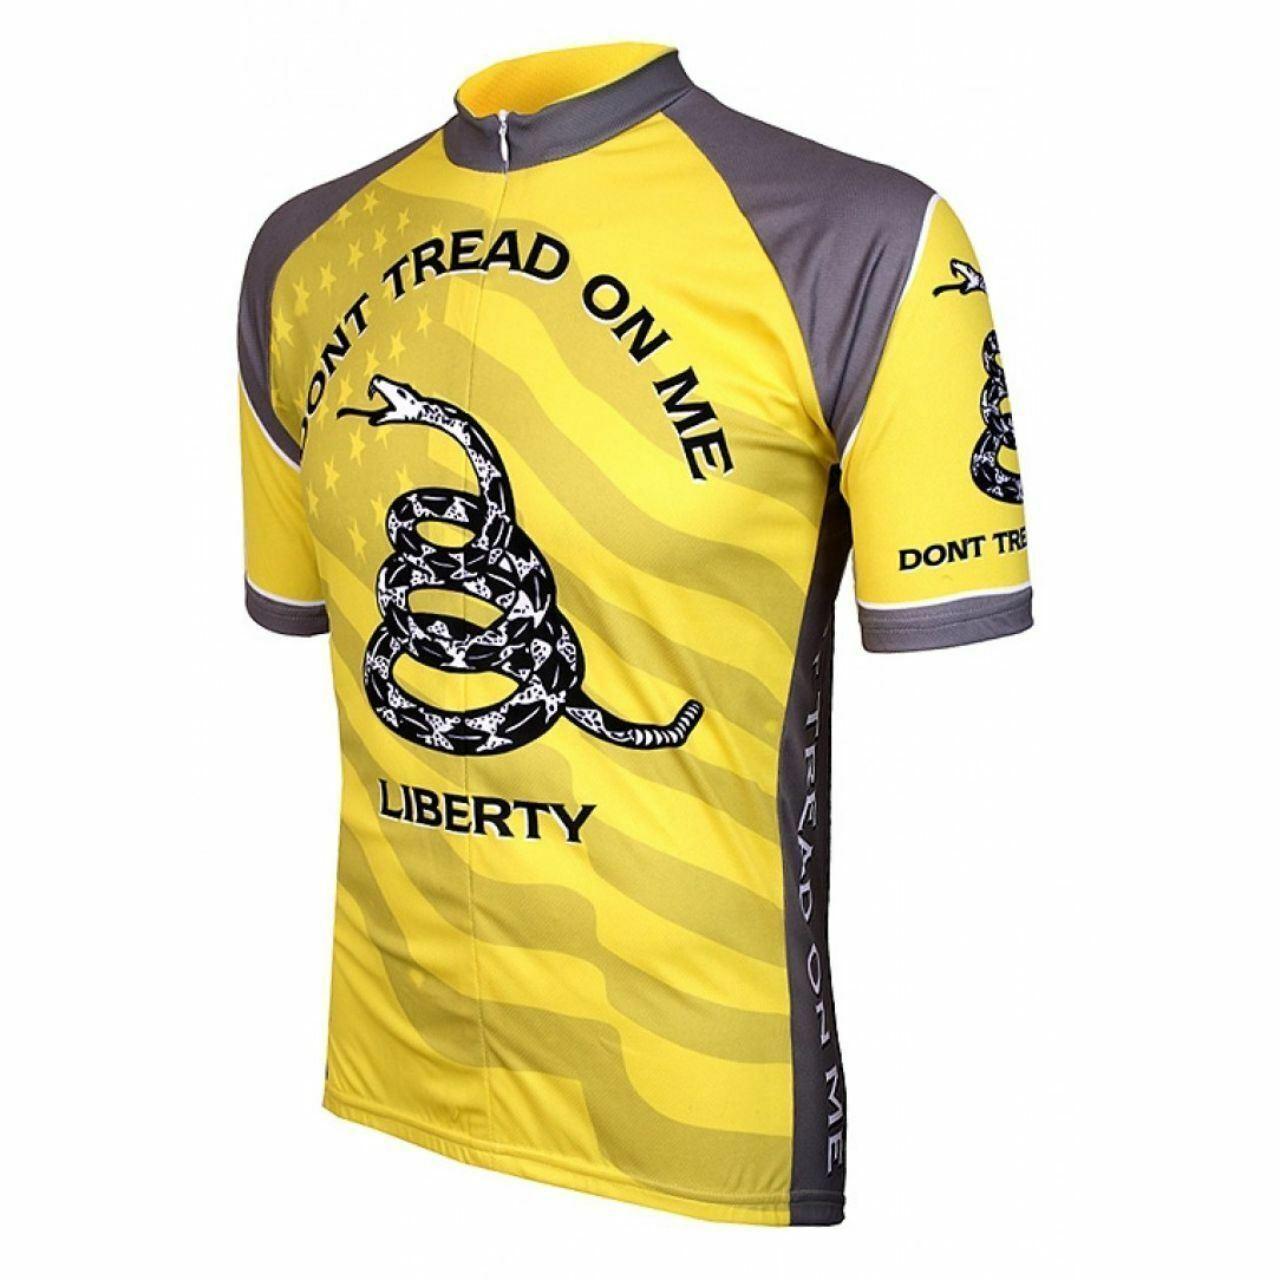 Don't Tread on Me  Men's Full Zip Short Sleeve Cycling Jersey